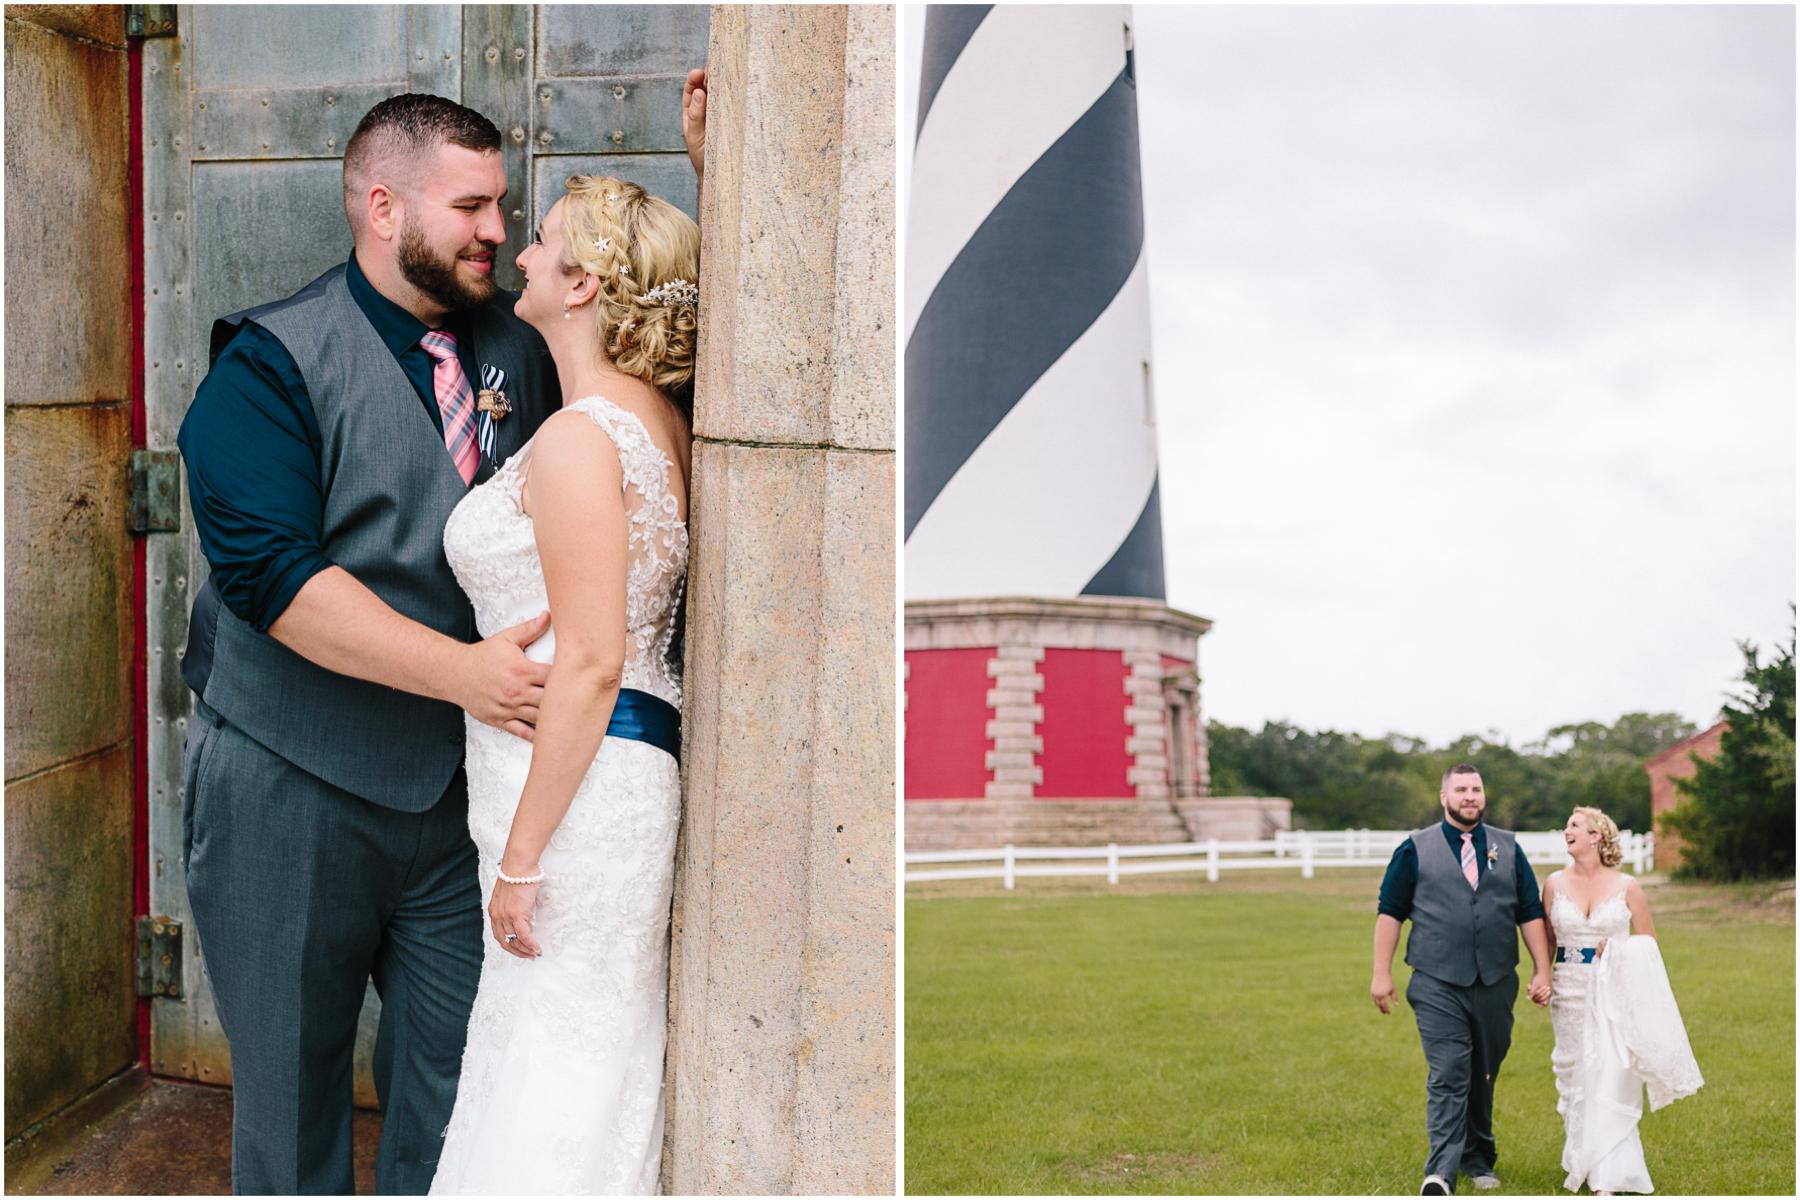 alyssa barletter photography buxton north carolina outer banks obx cape hatteras elopement intmate beach wedding-43.jpg